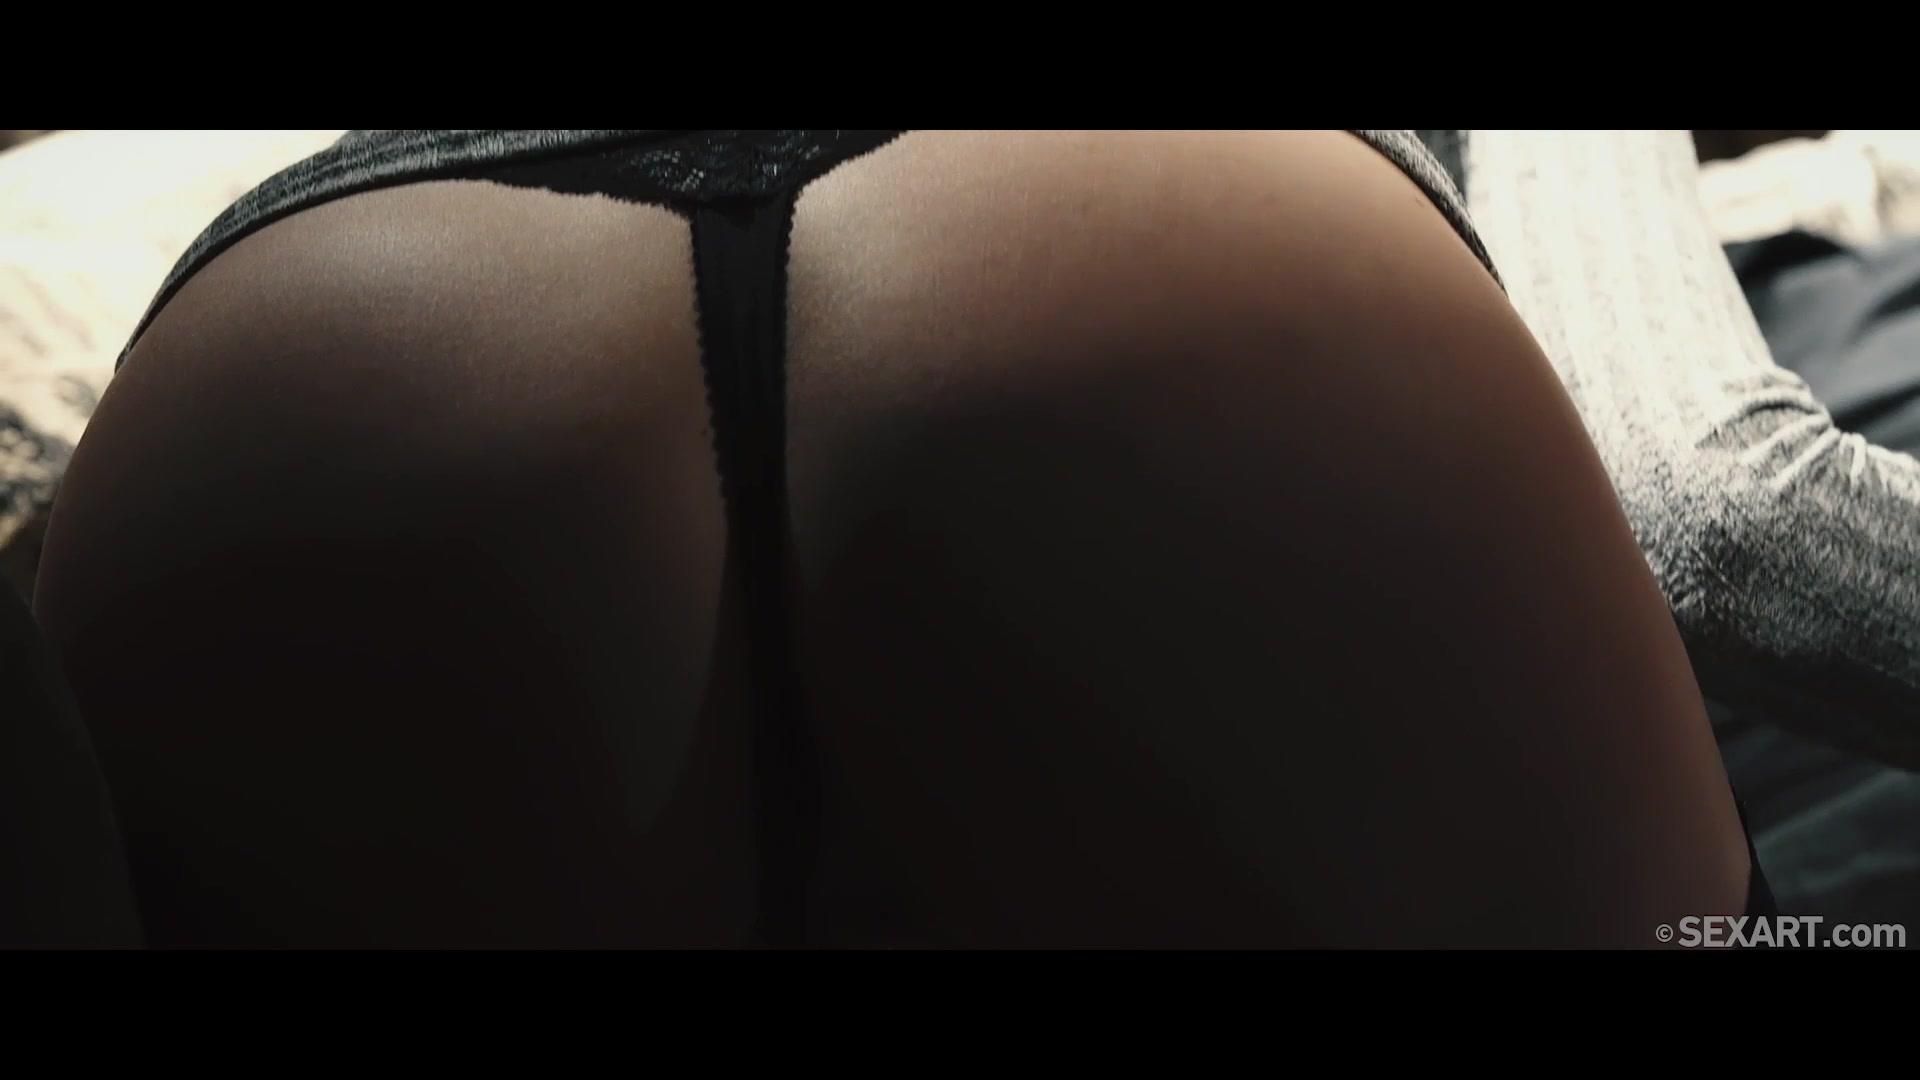 Sex Art Daisy Lee 1 5 2020